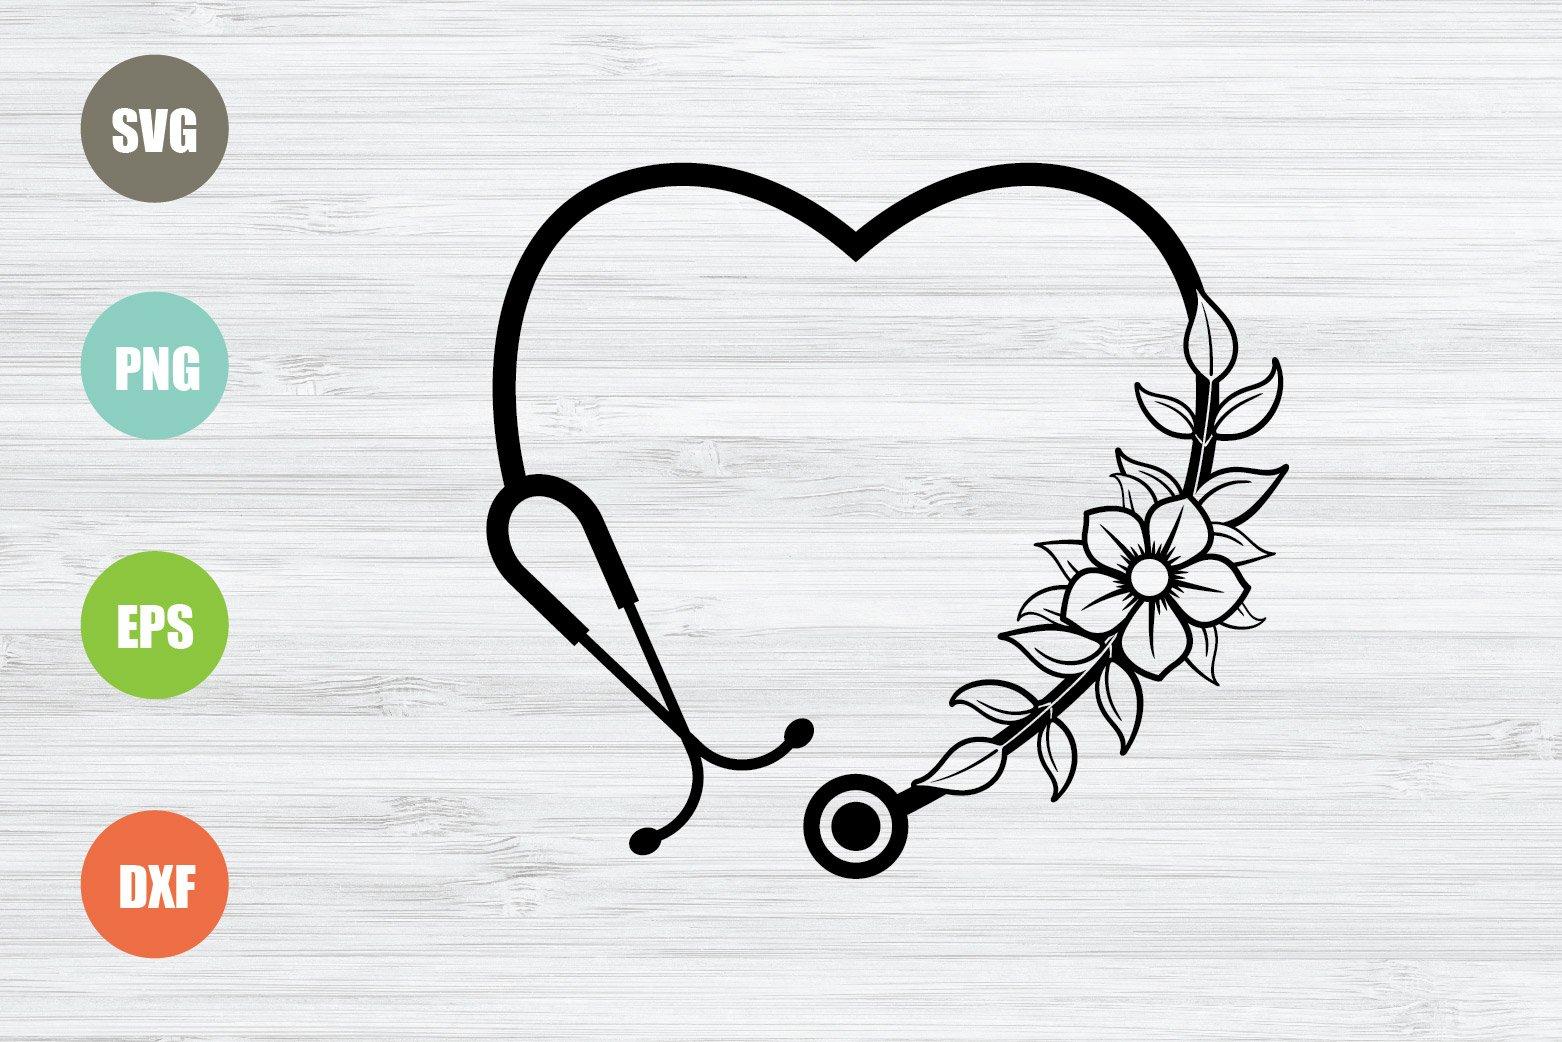 Stethoscope SVG, Floral Stethoscope SVG, Heart SVG example image 1